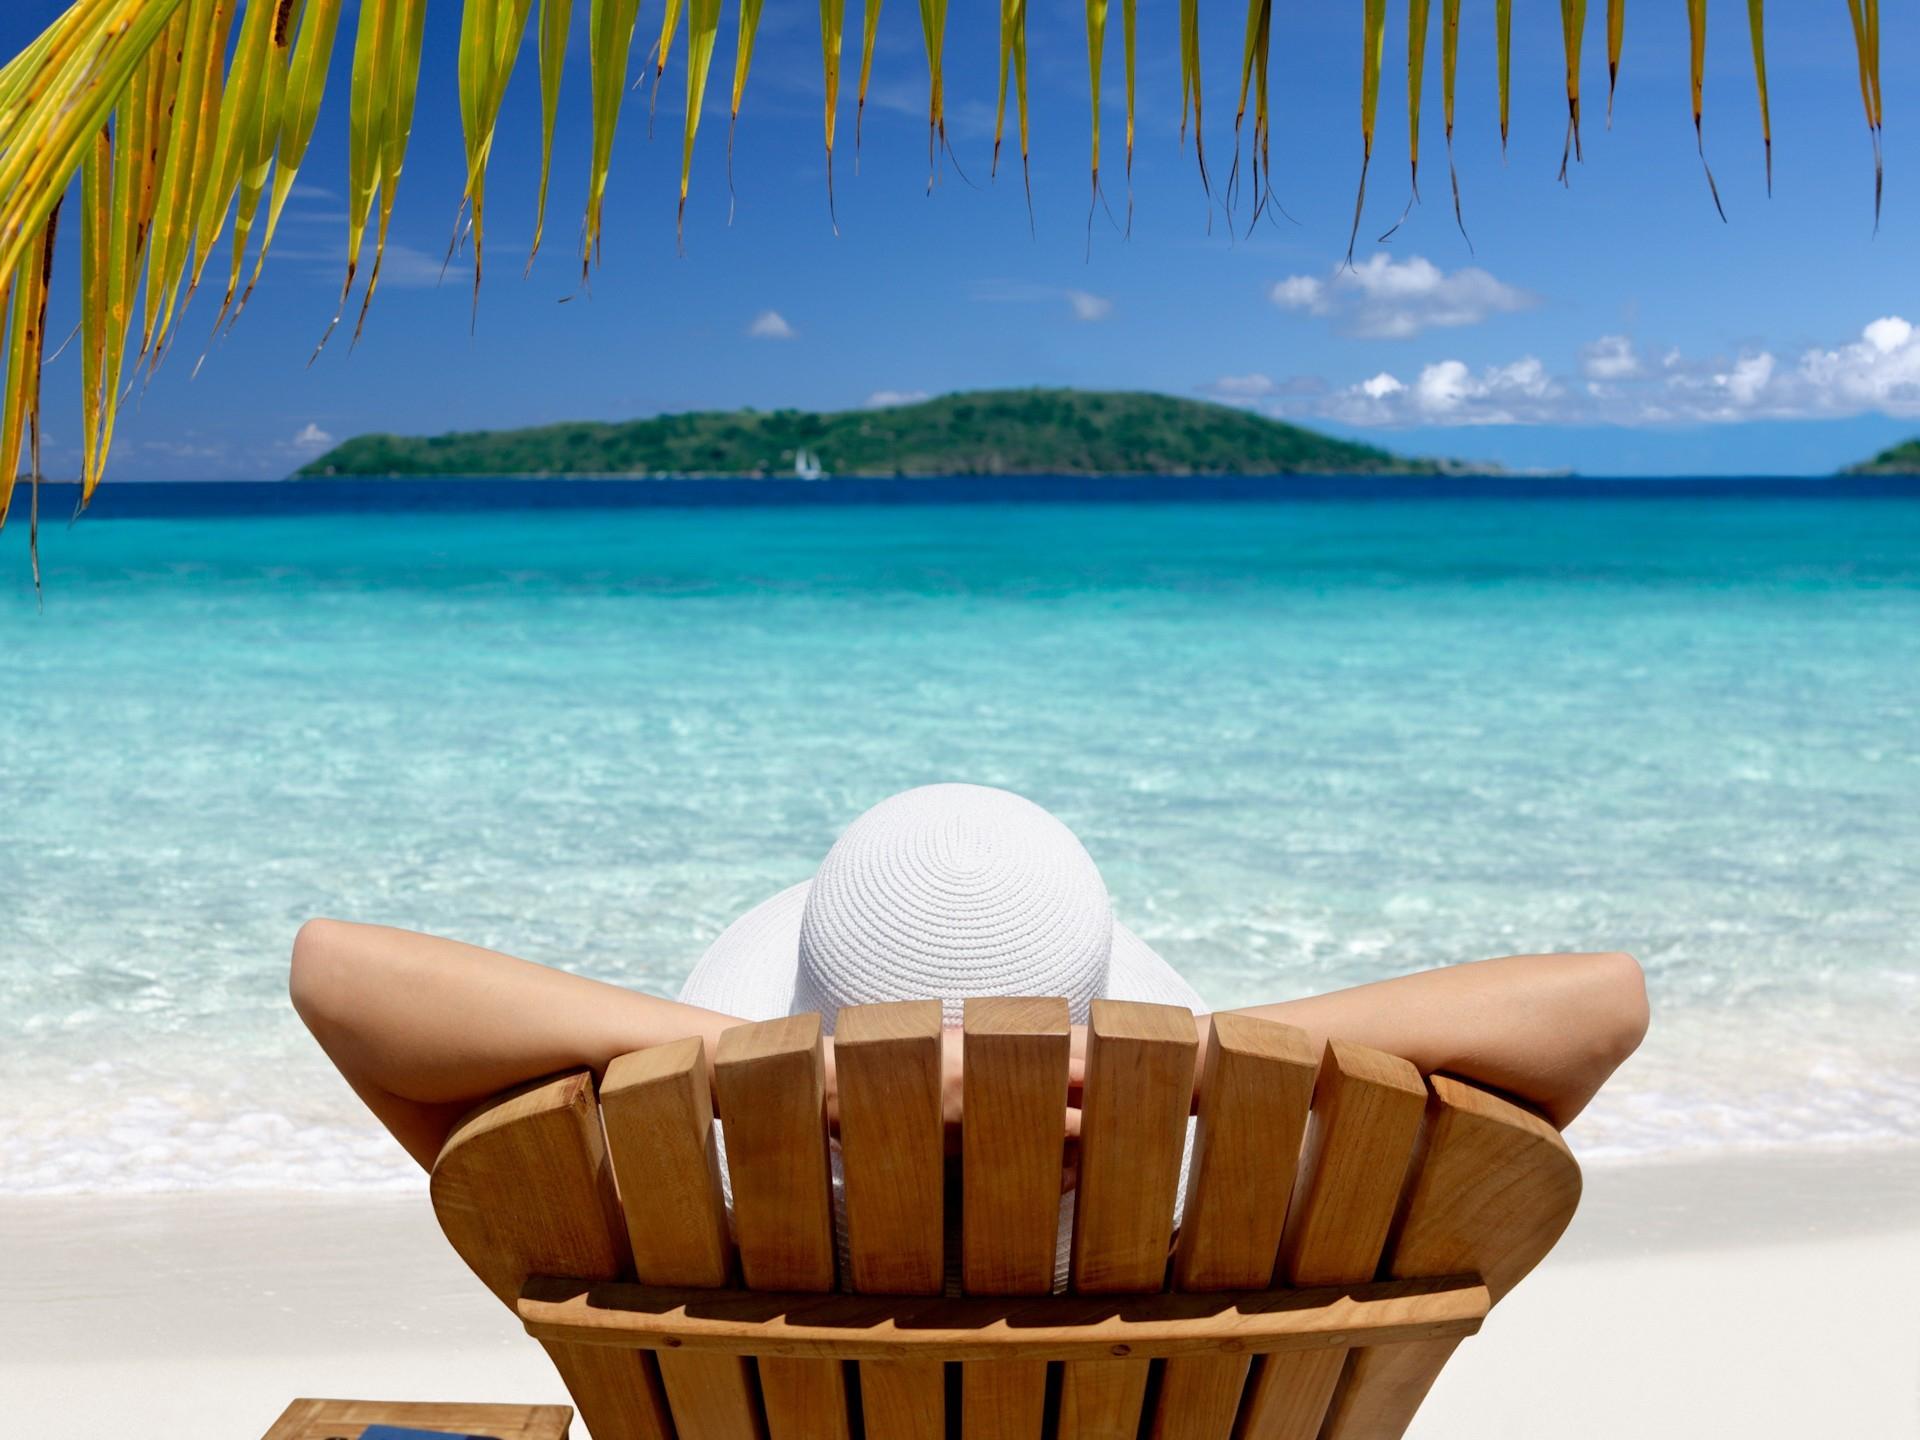 Картинка тема отпуск